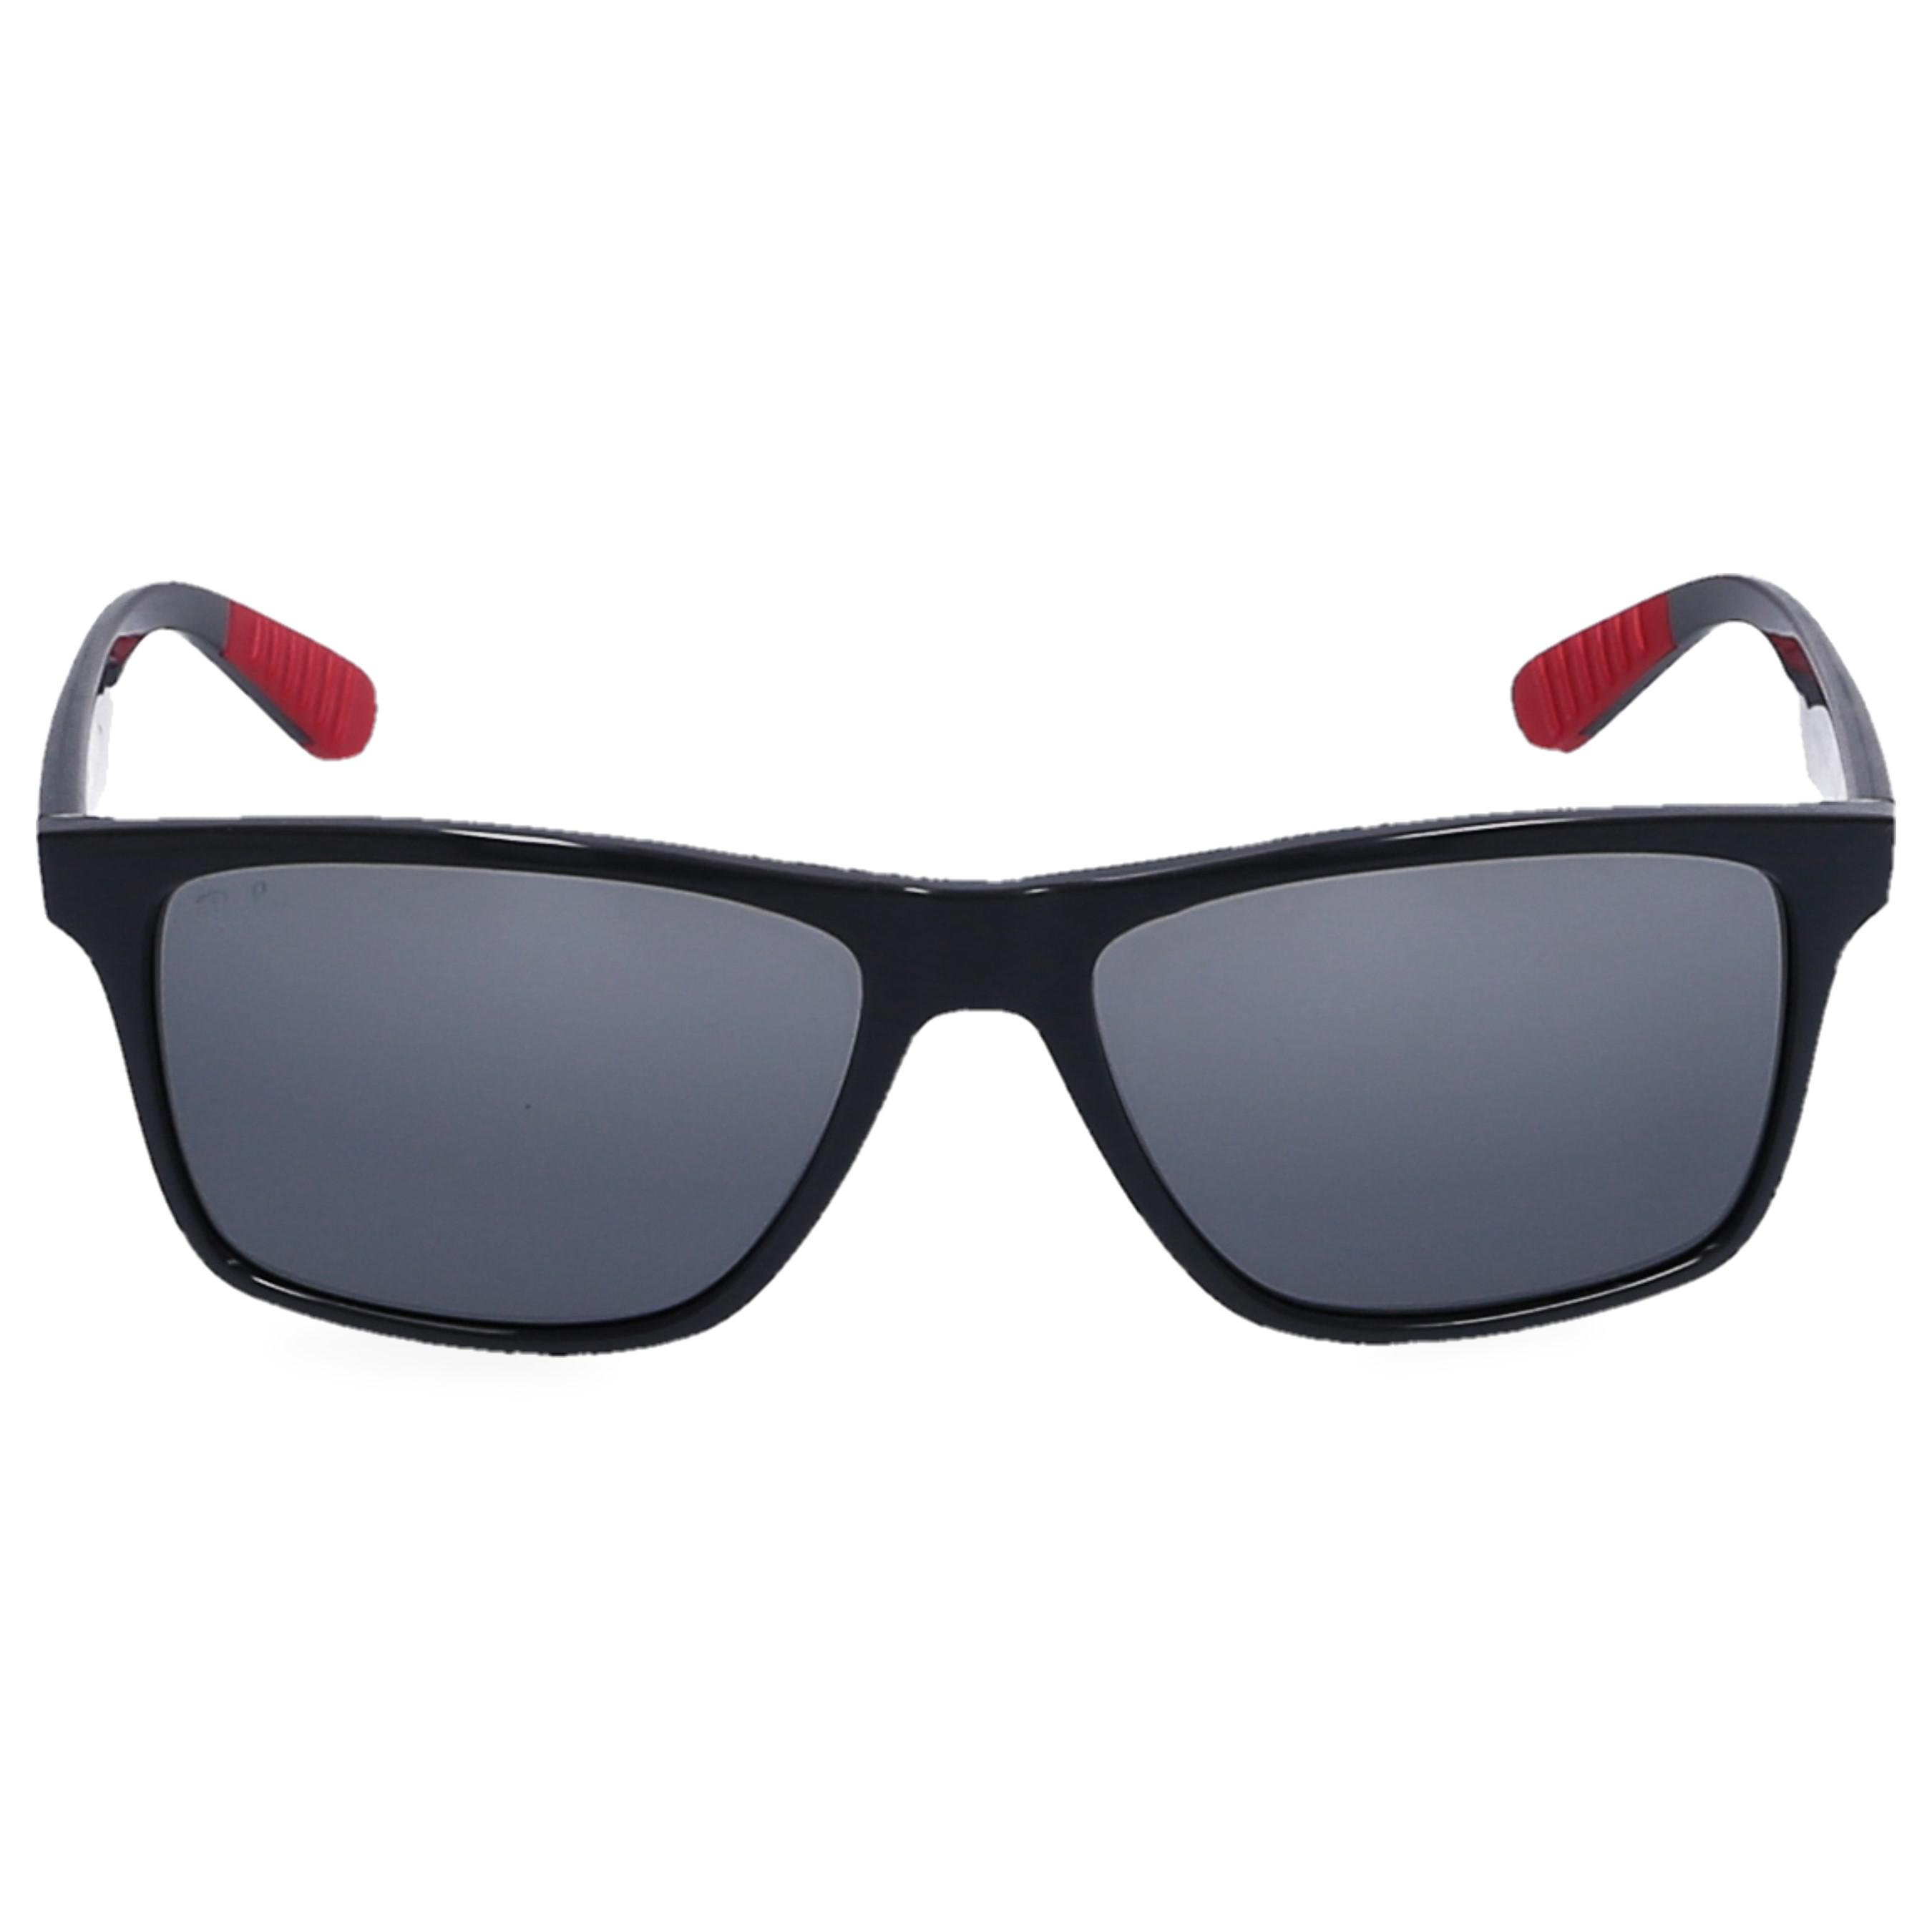 a7fbe02304 Lyst - Ray-Ban Men Sunglasses Wayfarer 4234 Acetate Black in Black ...